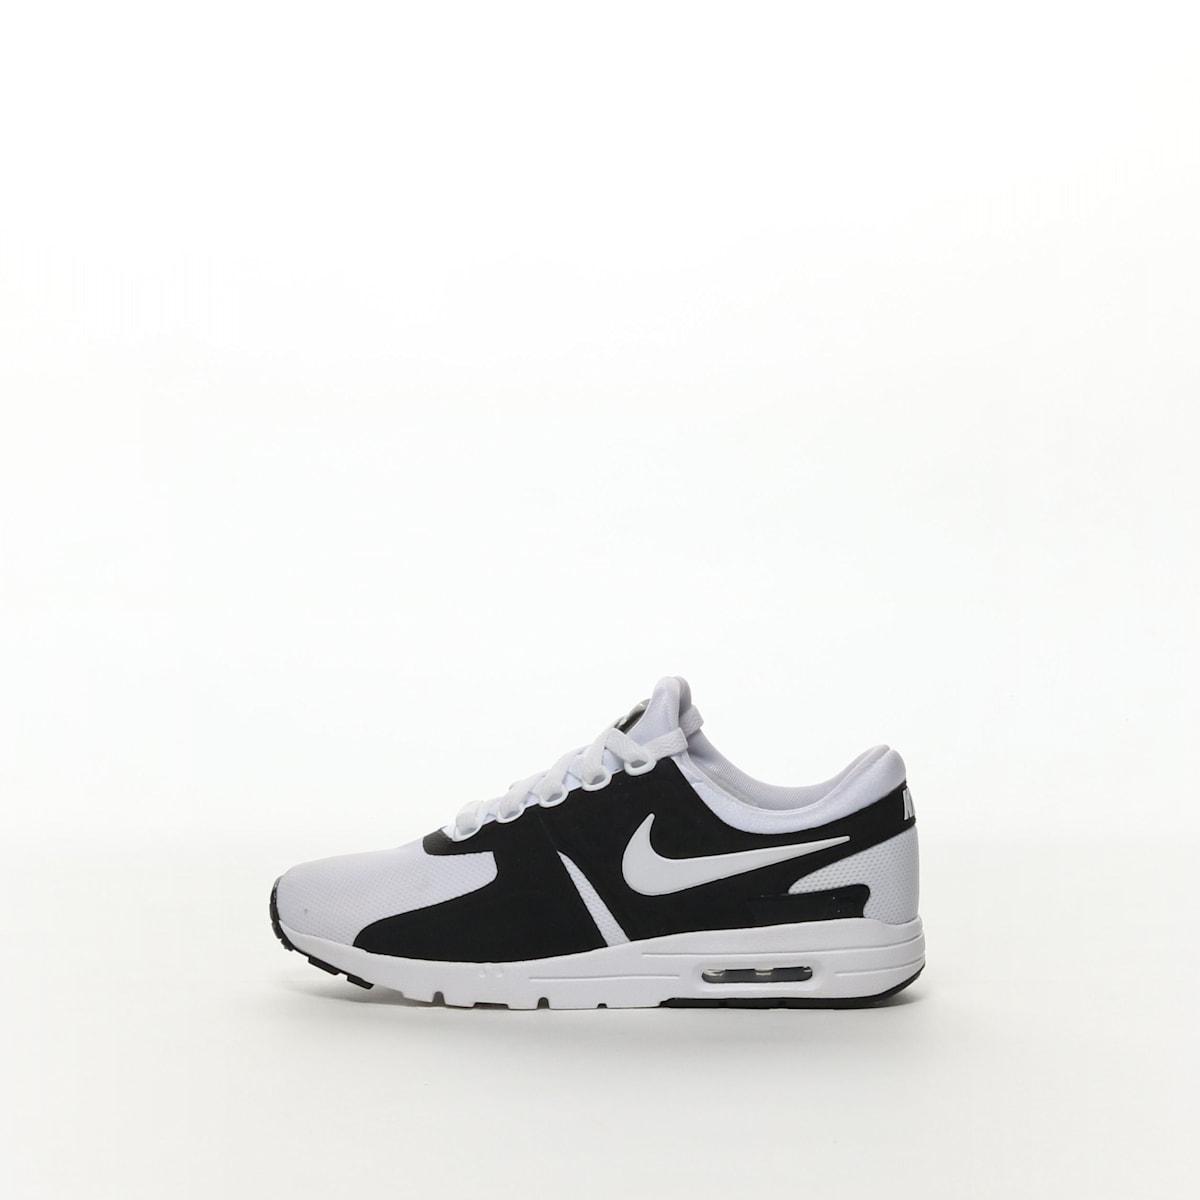 6b66552437 Women's Nike Air Max Zero Shoe - BLACK/WHITE – Resku